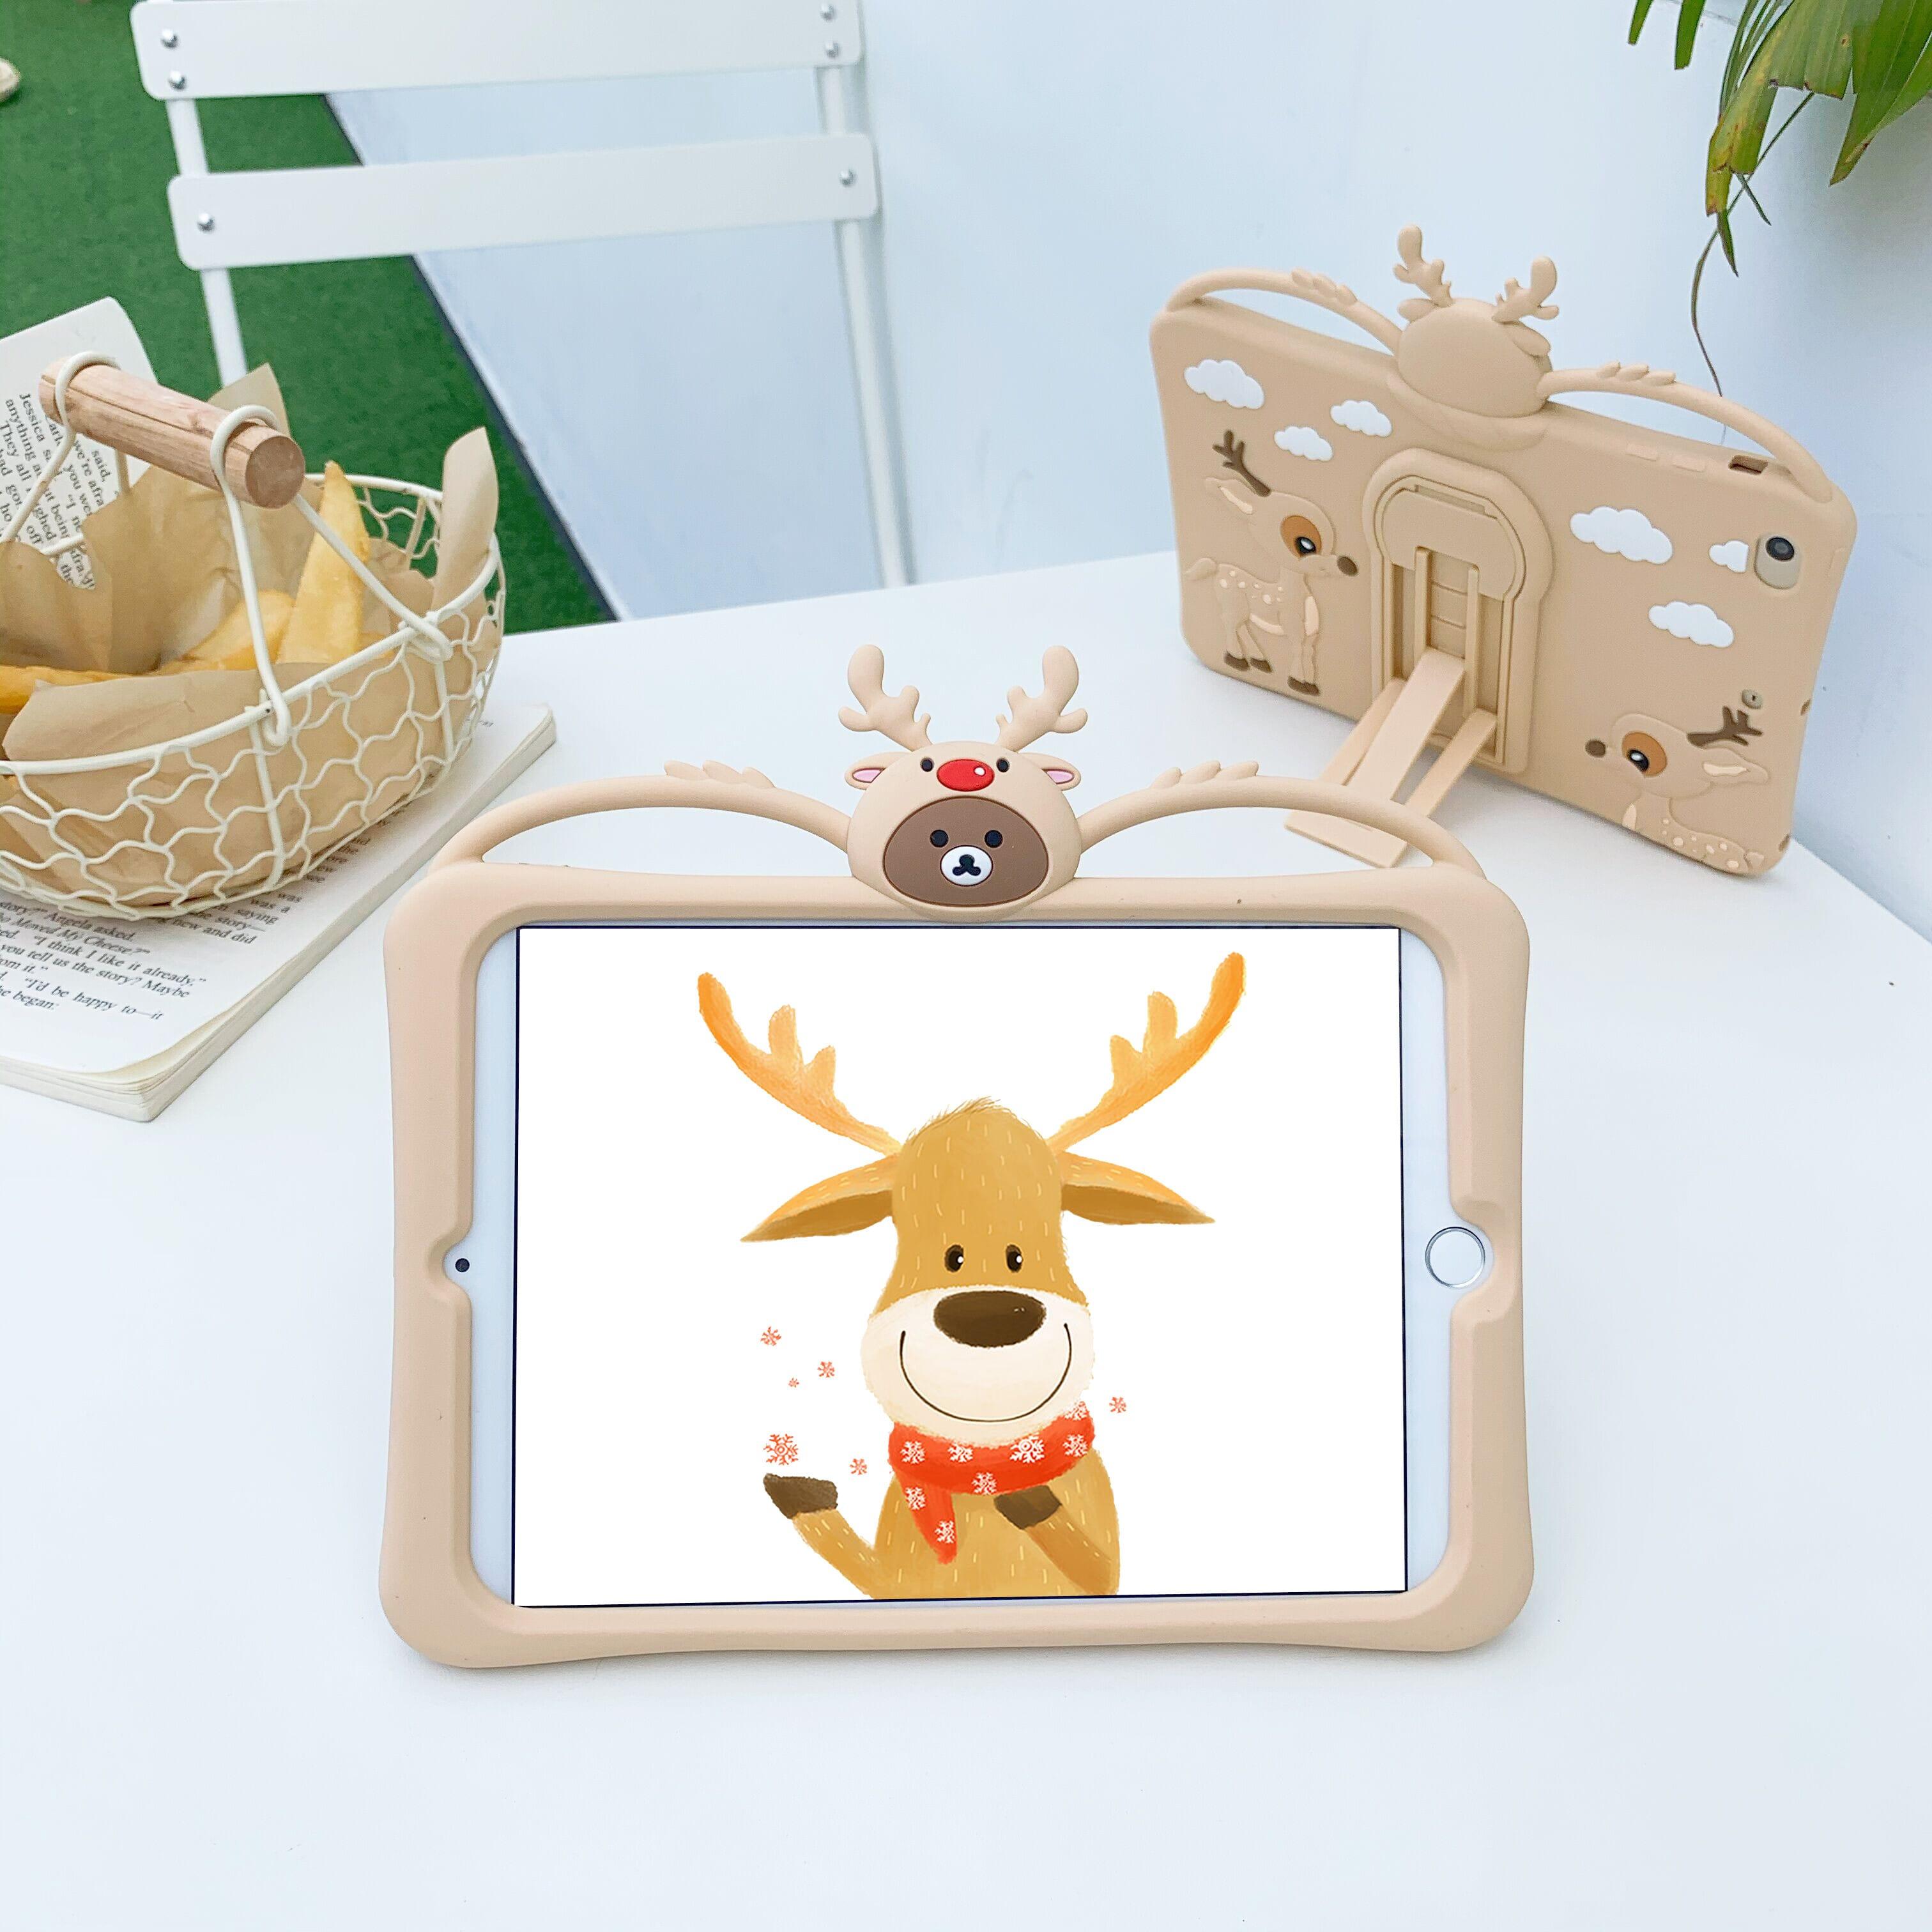 Trolsk Kids Case - Reindeer